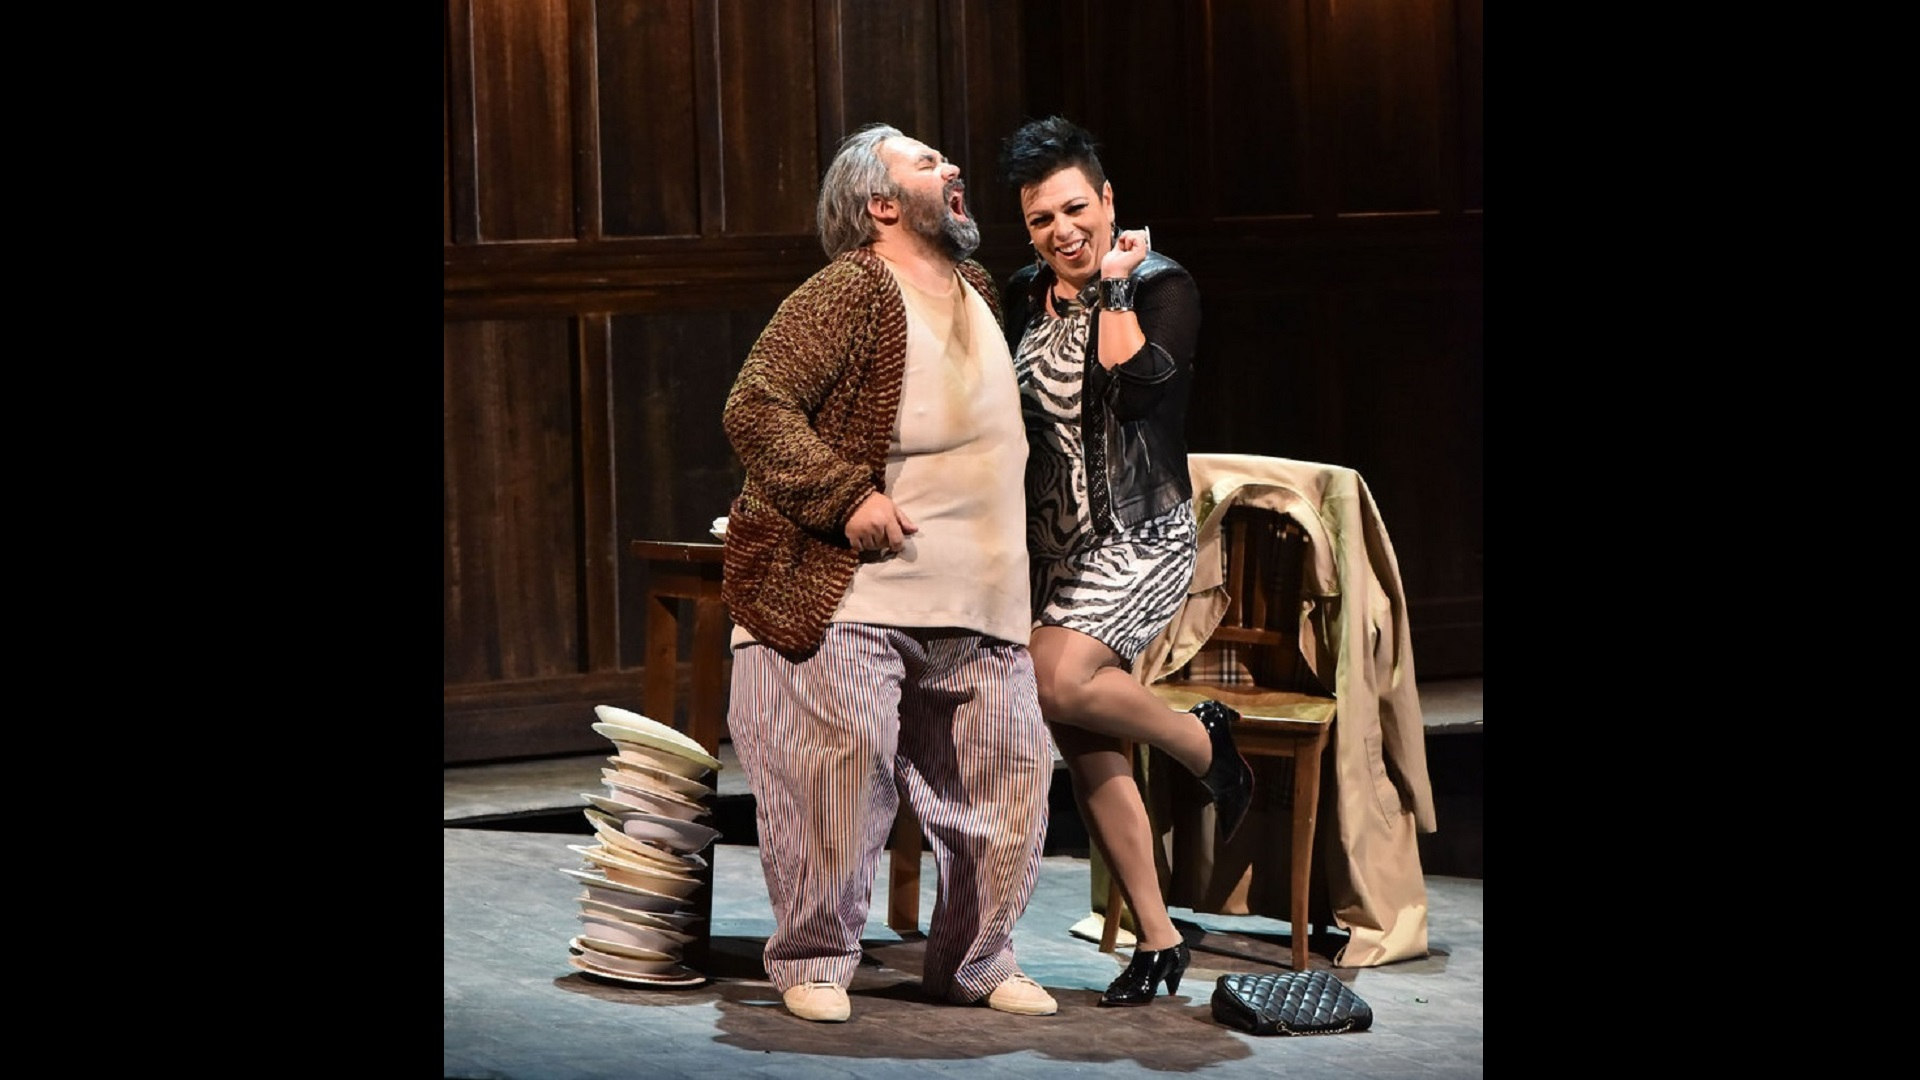 Falstaff-Opera-by-Giuseppe-Verdi-Opera-Director-Jacopo-Spirei-Festival-Verdi-Parma-2017-5